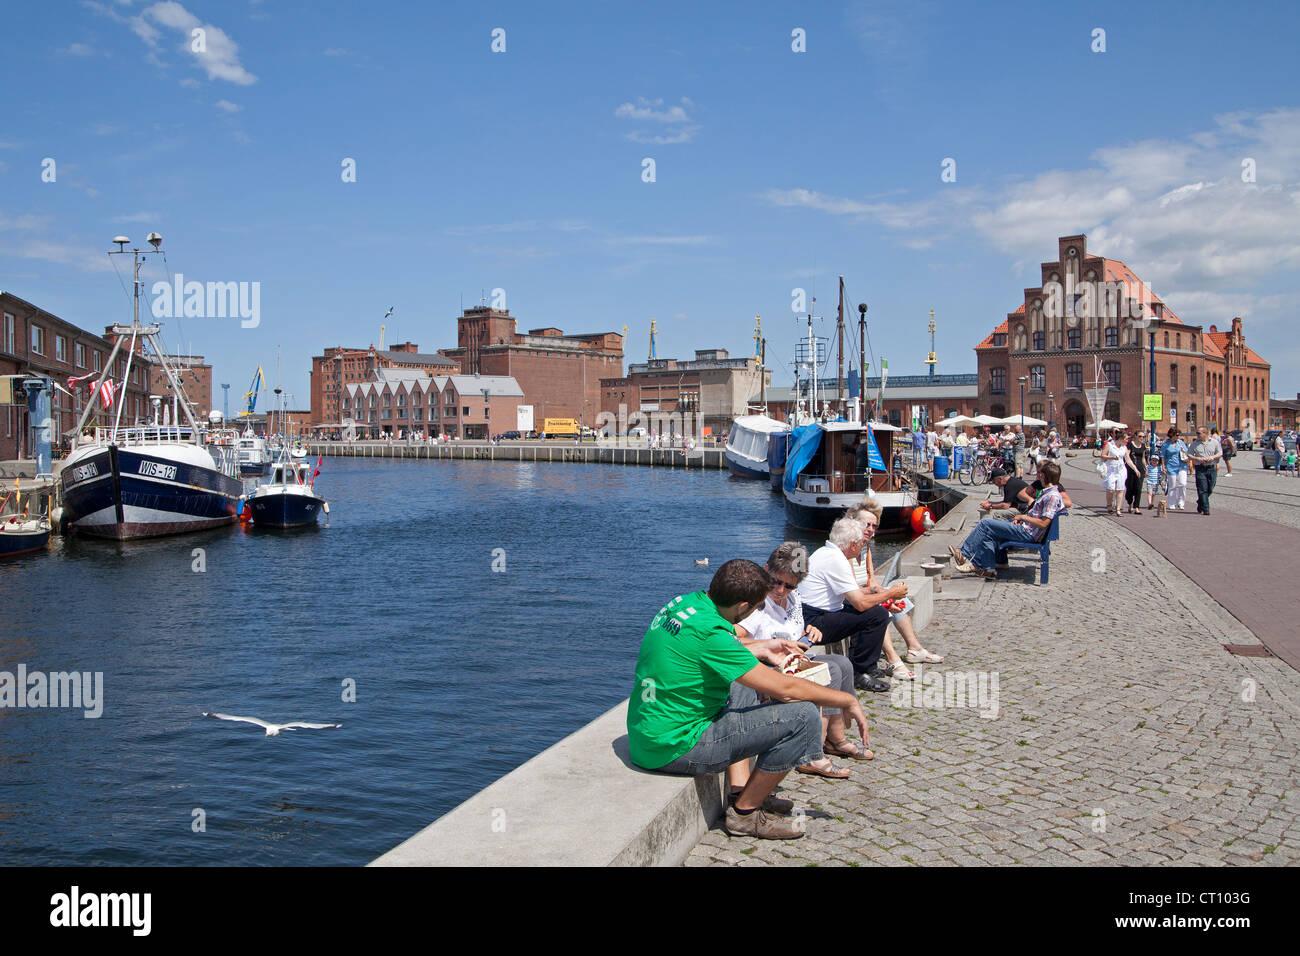 harbour, Wismar, Mecklenburg-West Pomerania, Germany - Stock Image